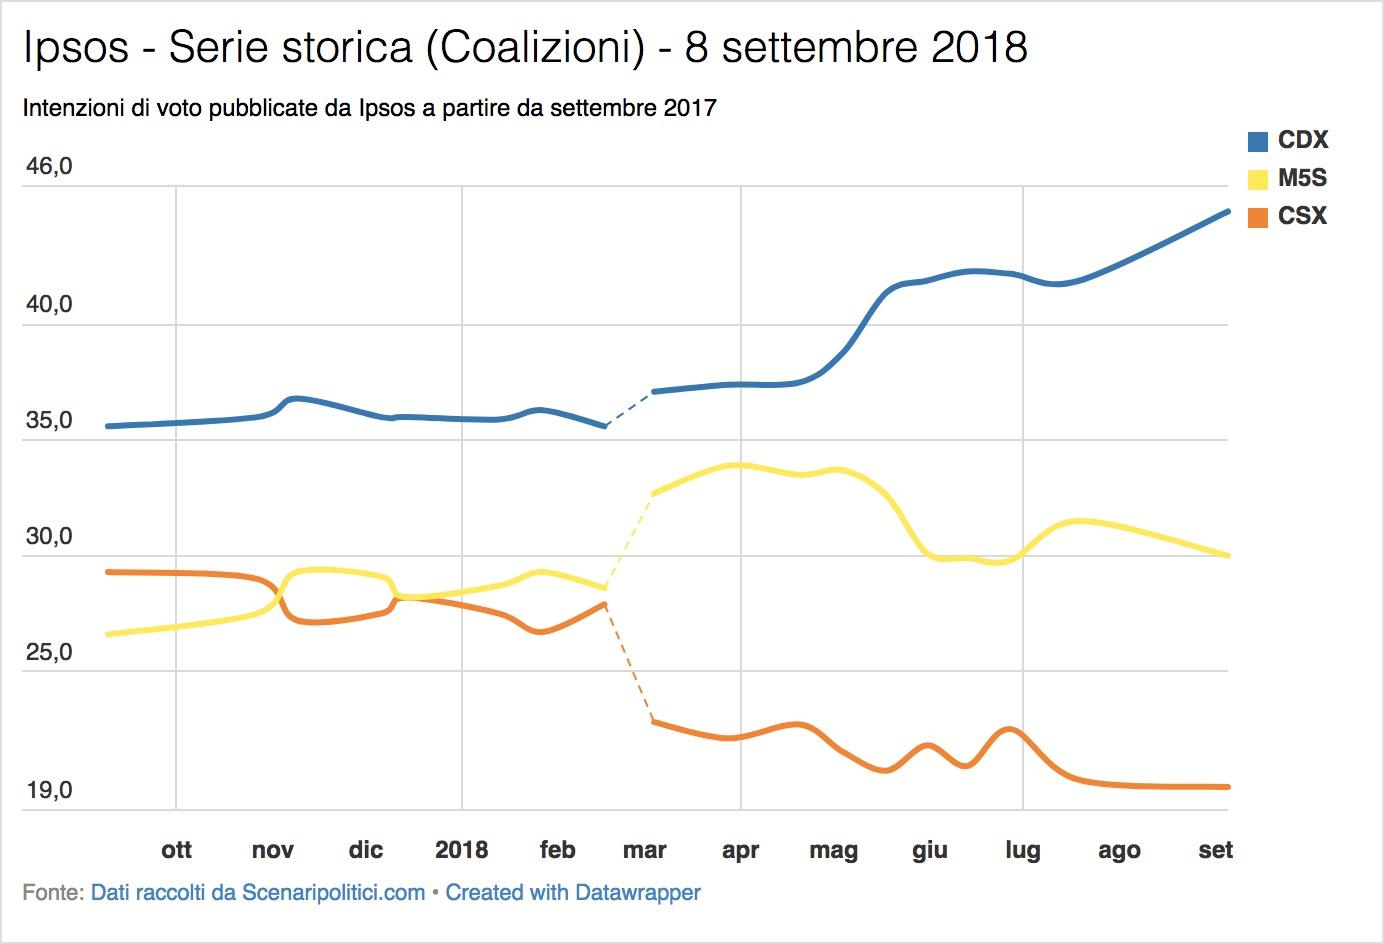 Sondaggio Ipsos (8 settembre 2018)